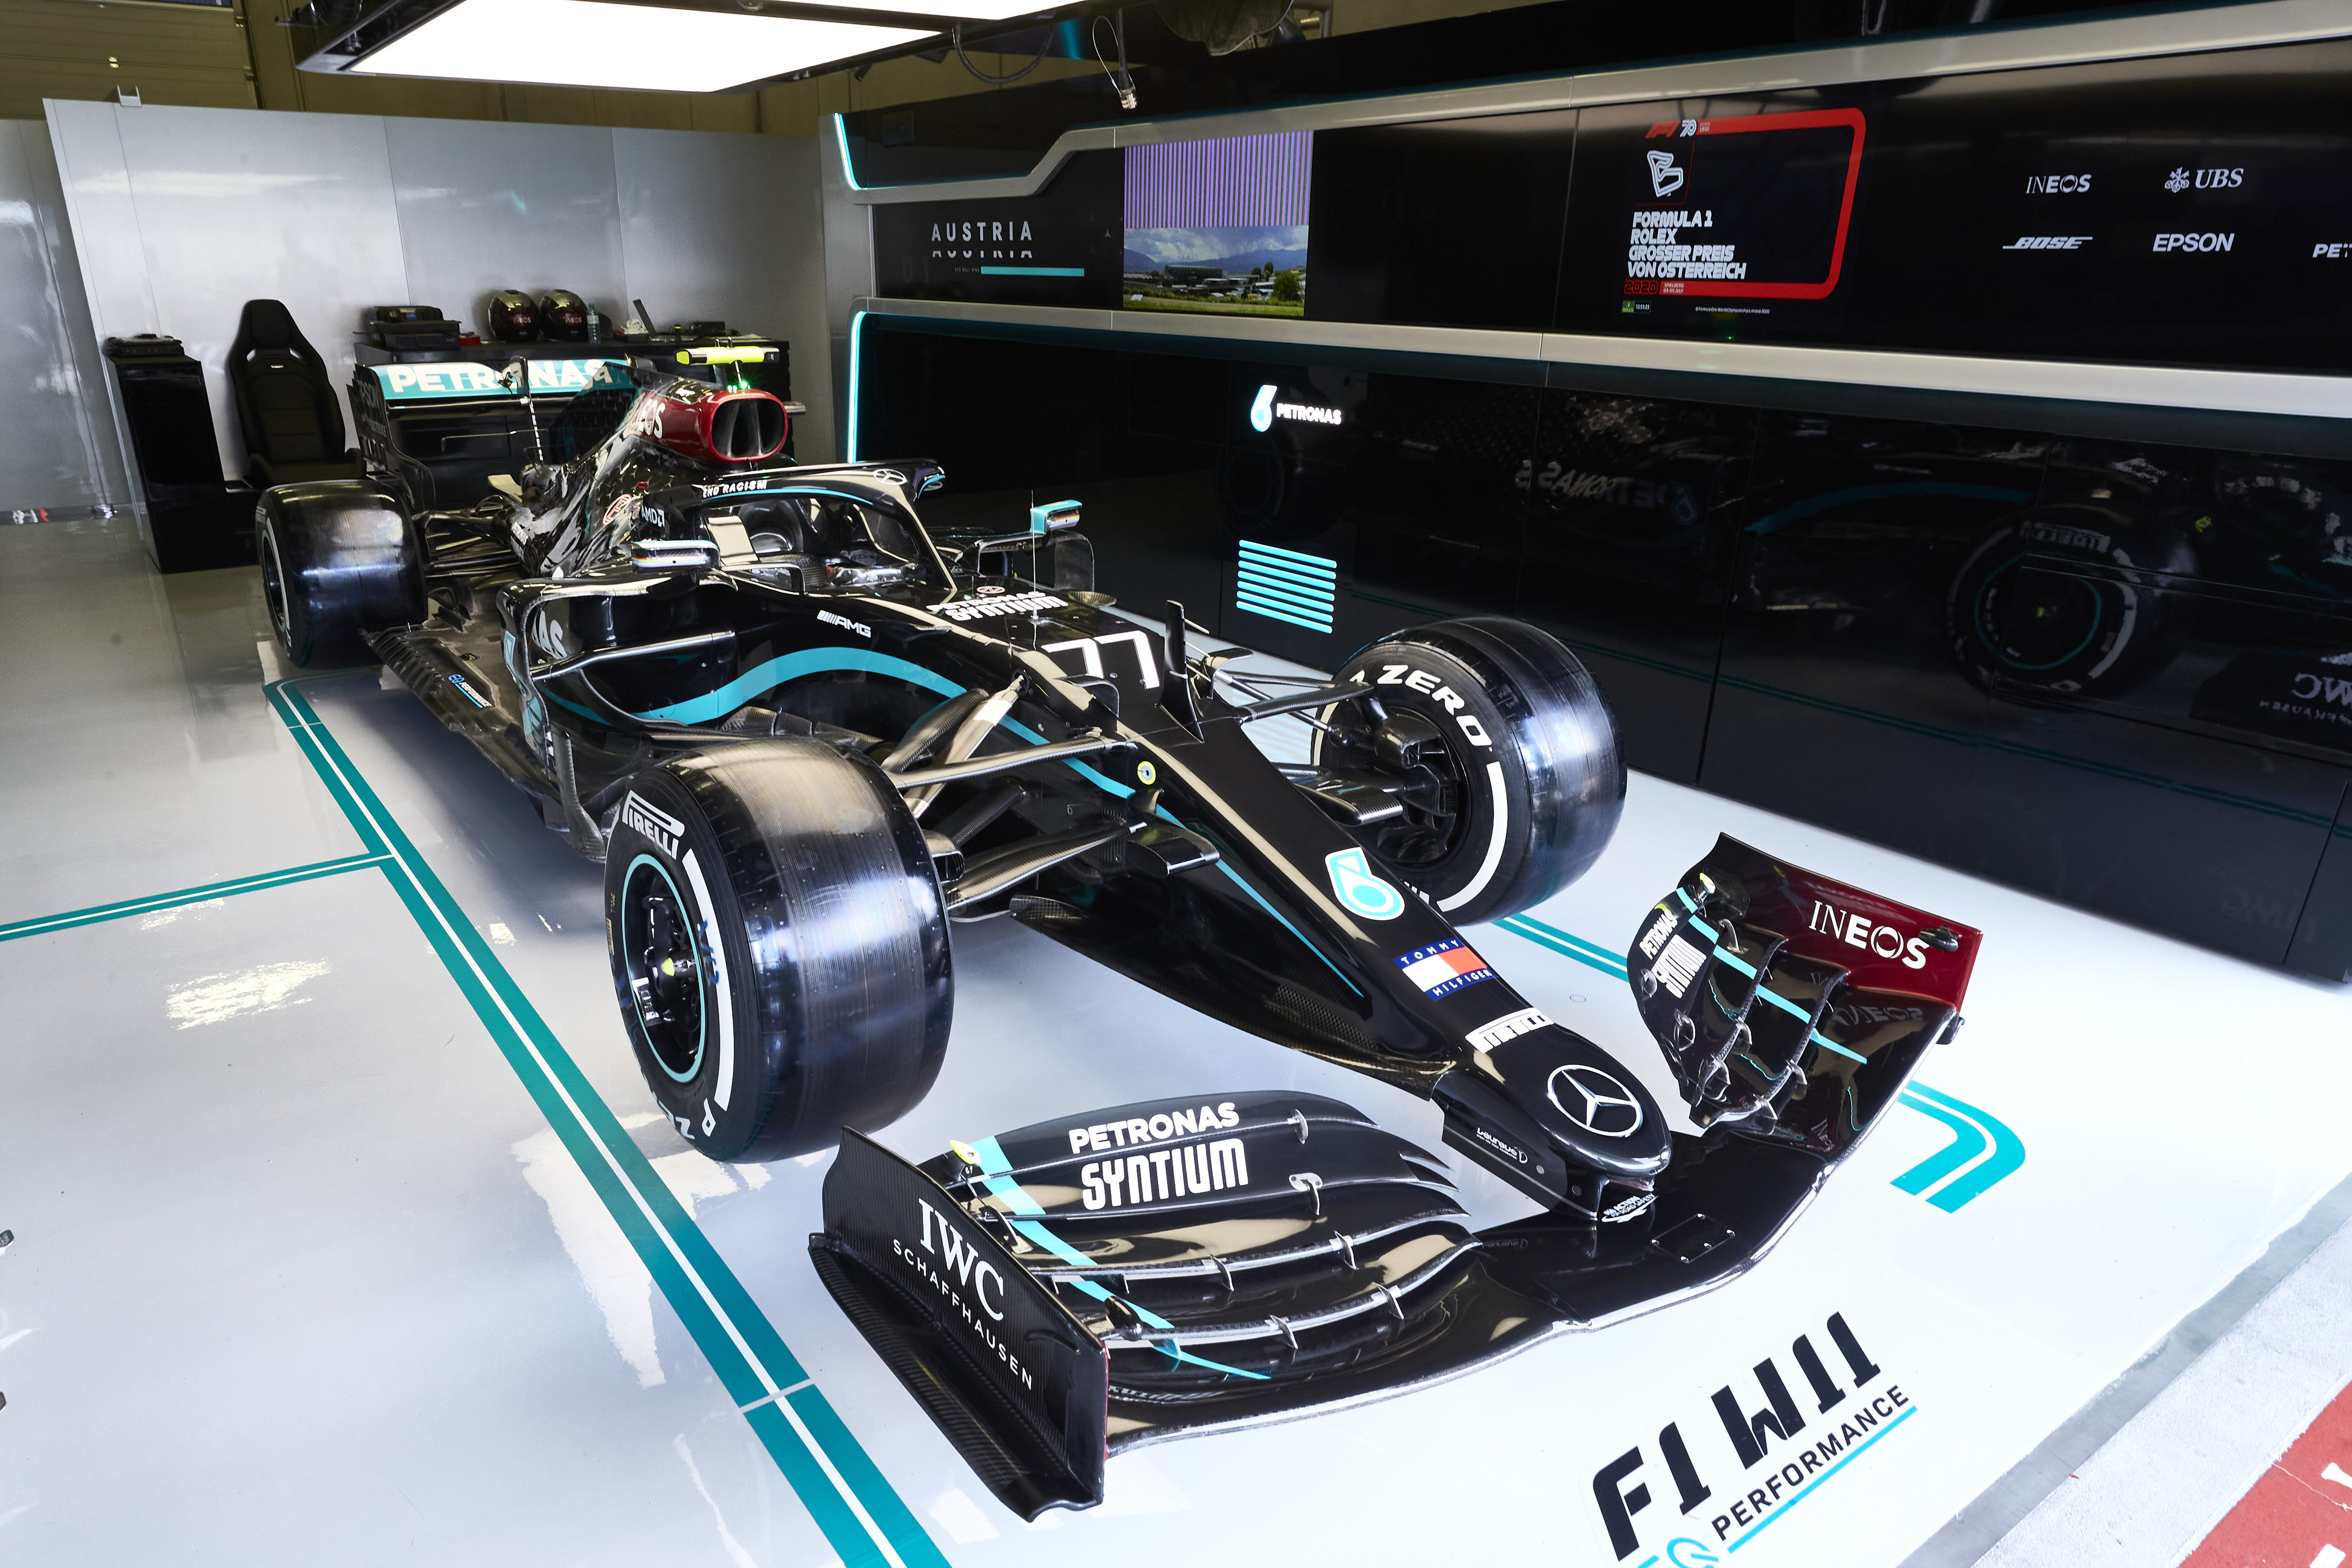 Mercedes black livery